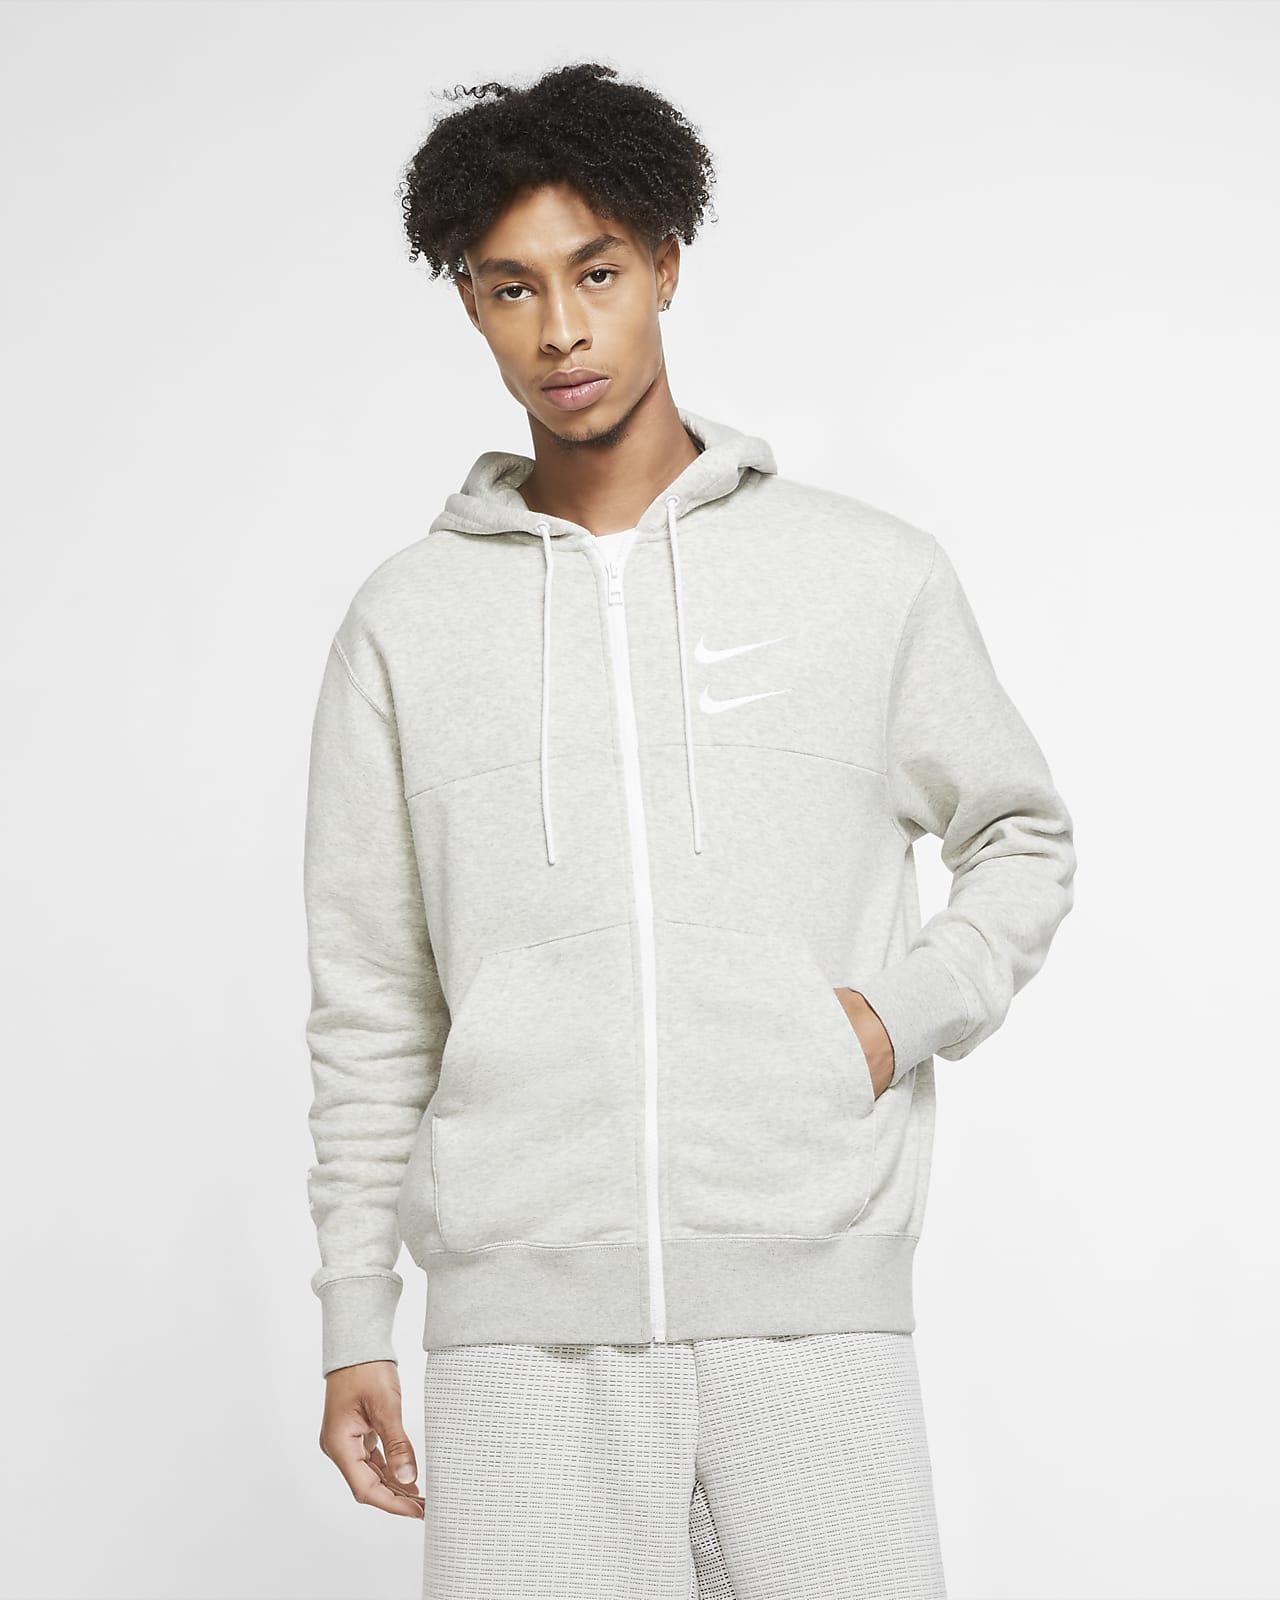 Nike Sportswear Swoosh Men's Full-Zip Hoodie